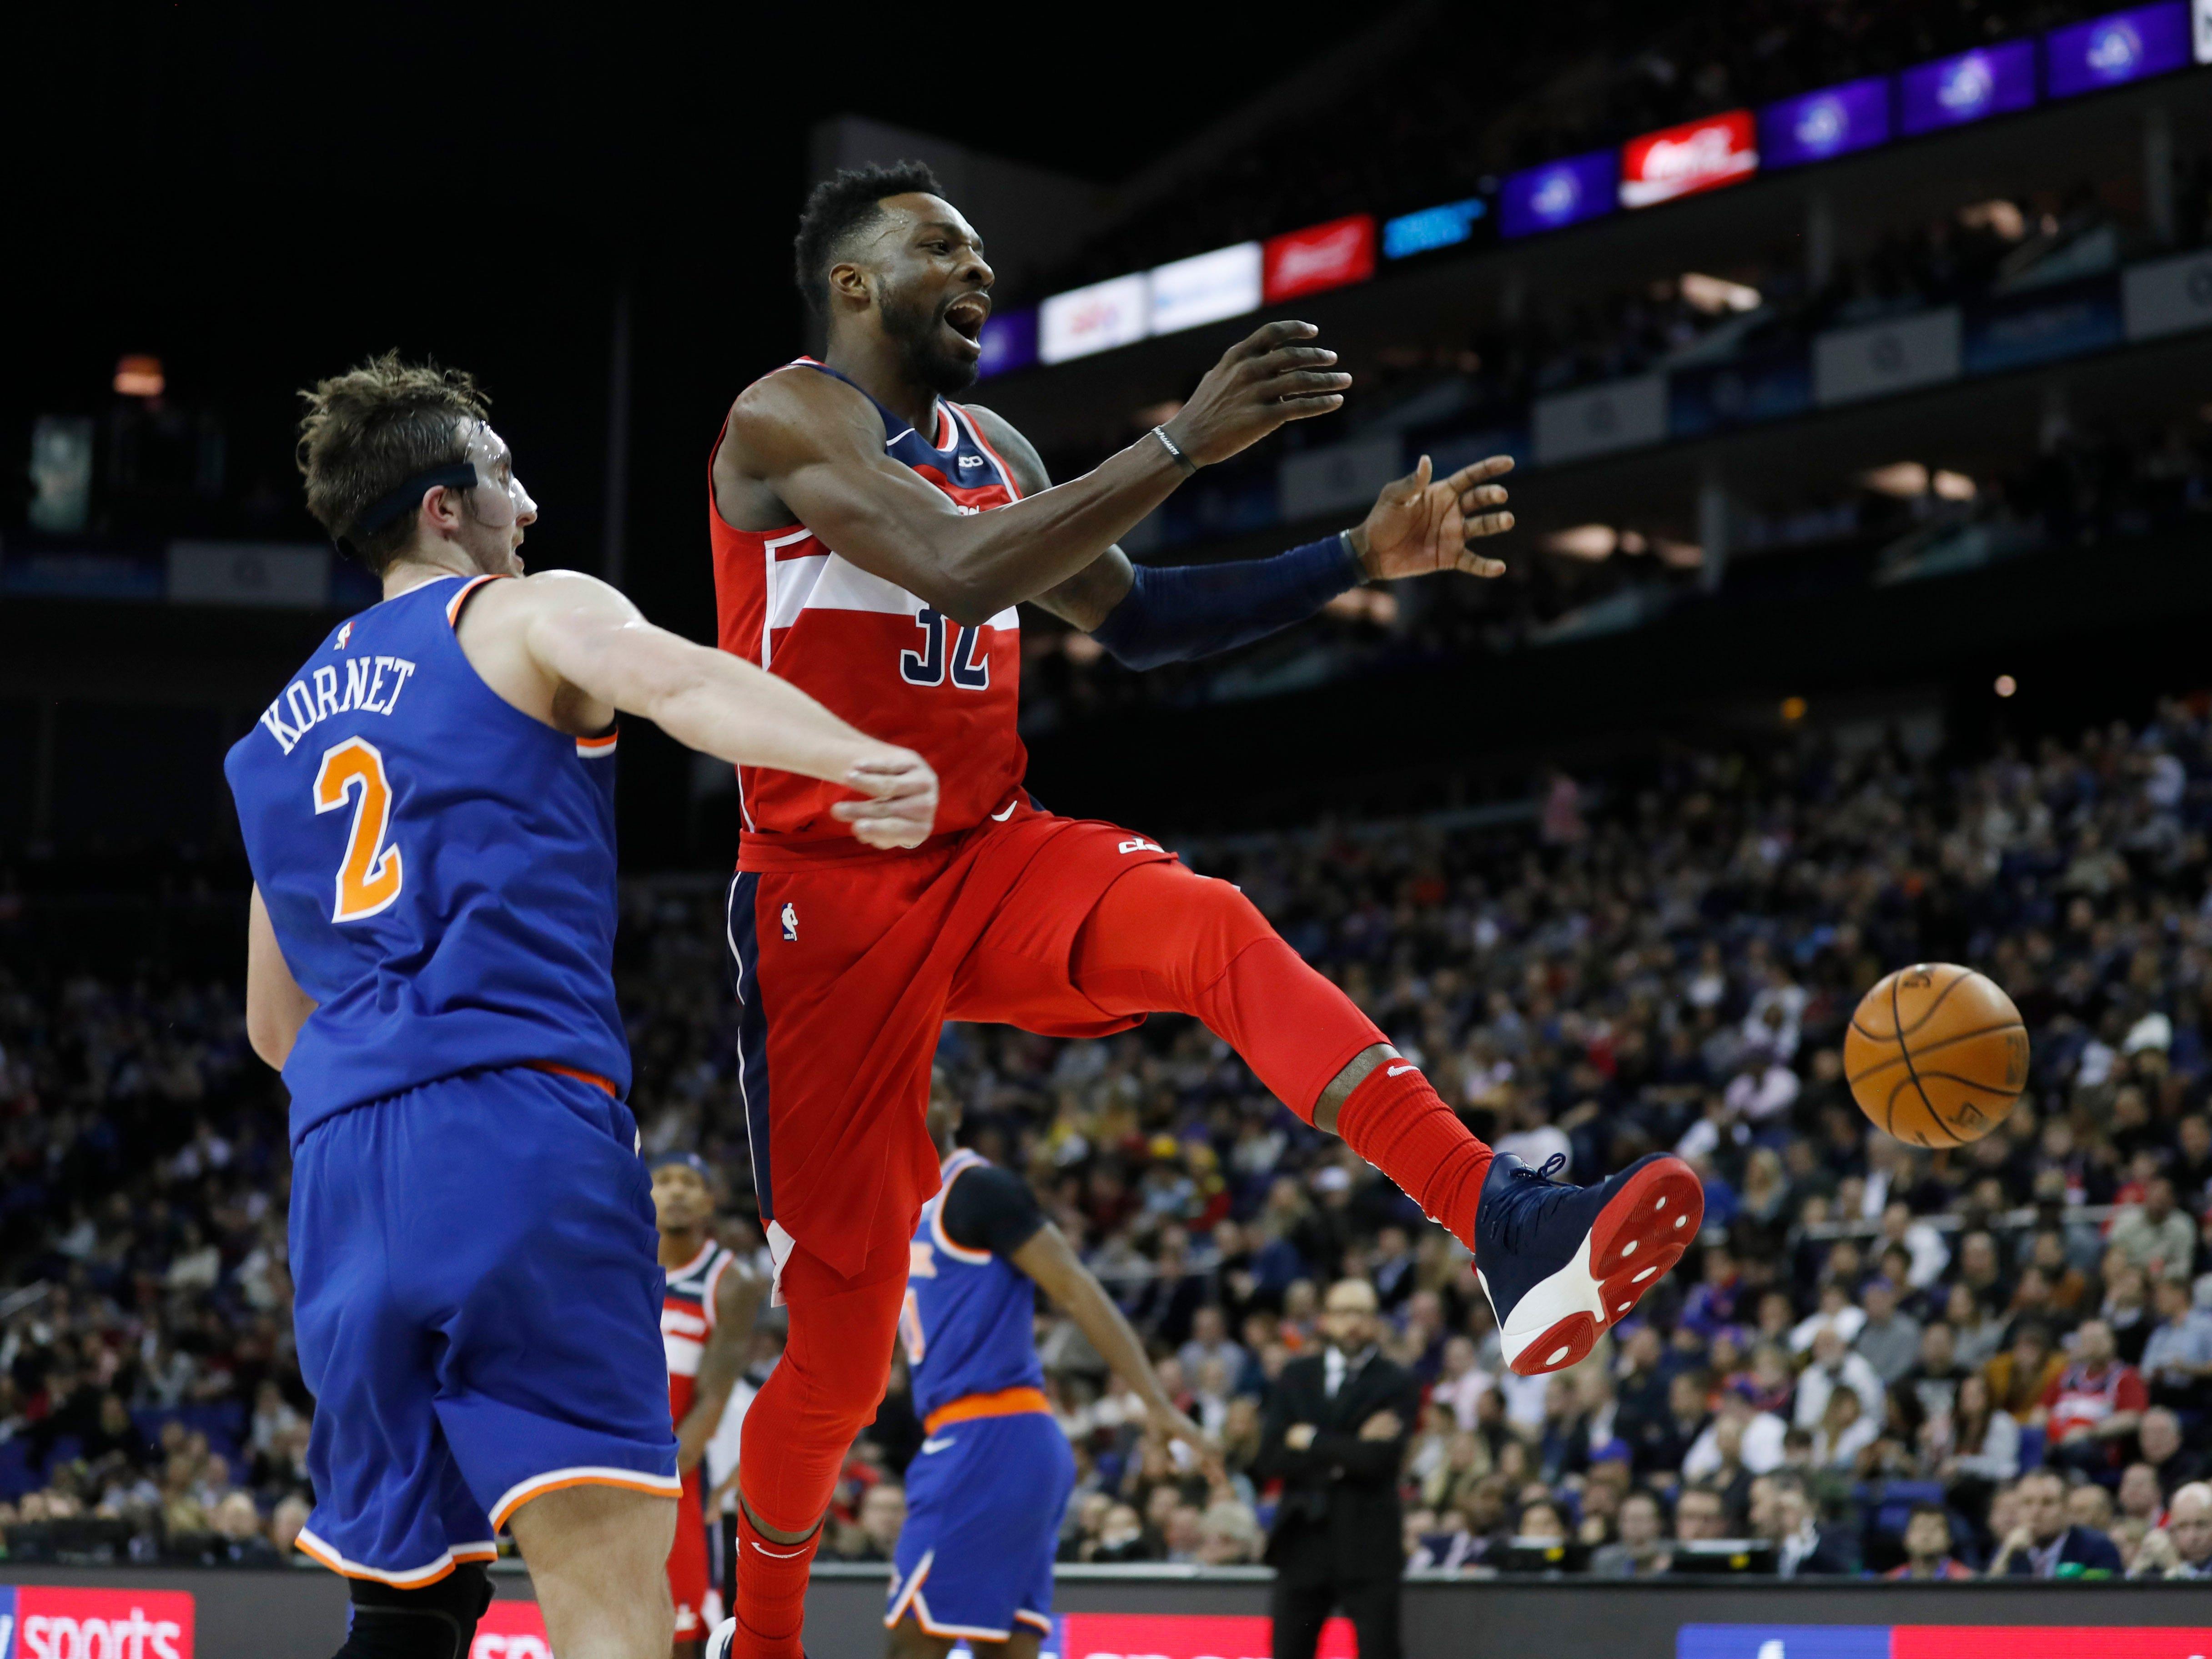 Washington Wizards forward Jeff Green (32), right, is fouled by New York Knicks forward Luke Kornet (2) during an NBA basketball game between New York Knicks and Washington Wizards at the O2 Arena, in London, Thursday, Jan.17, 2019.